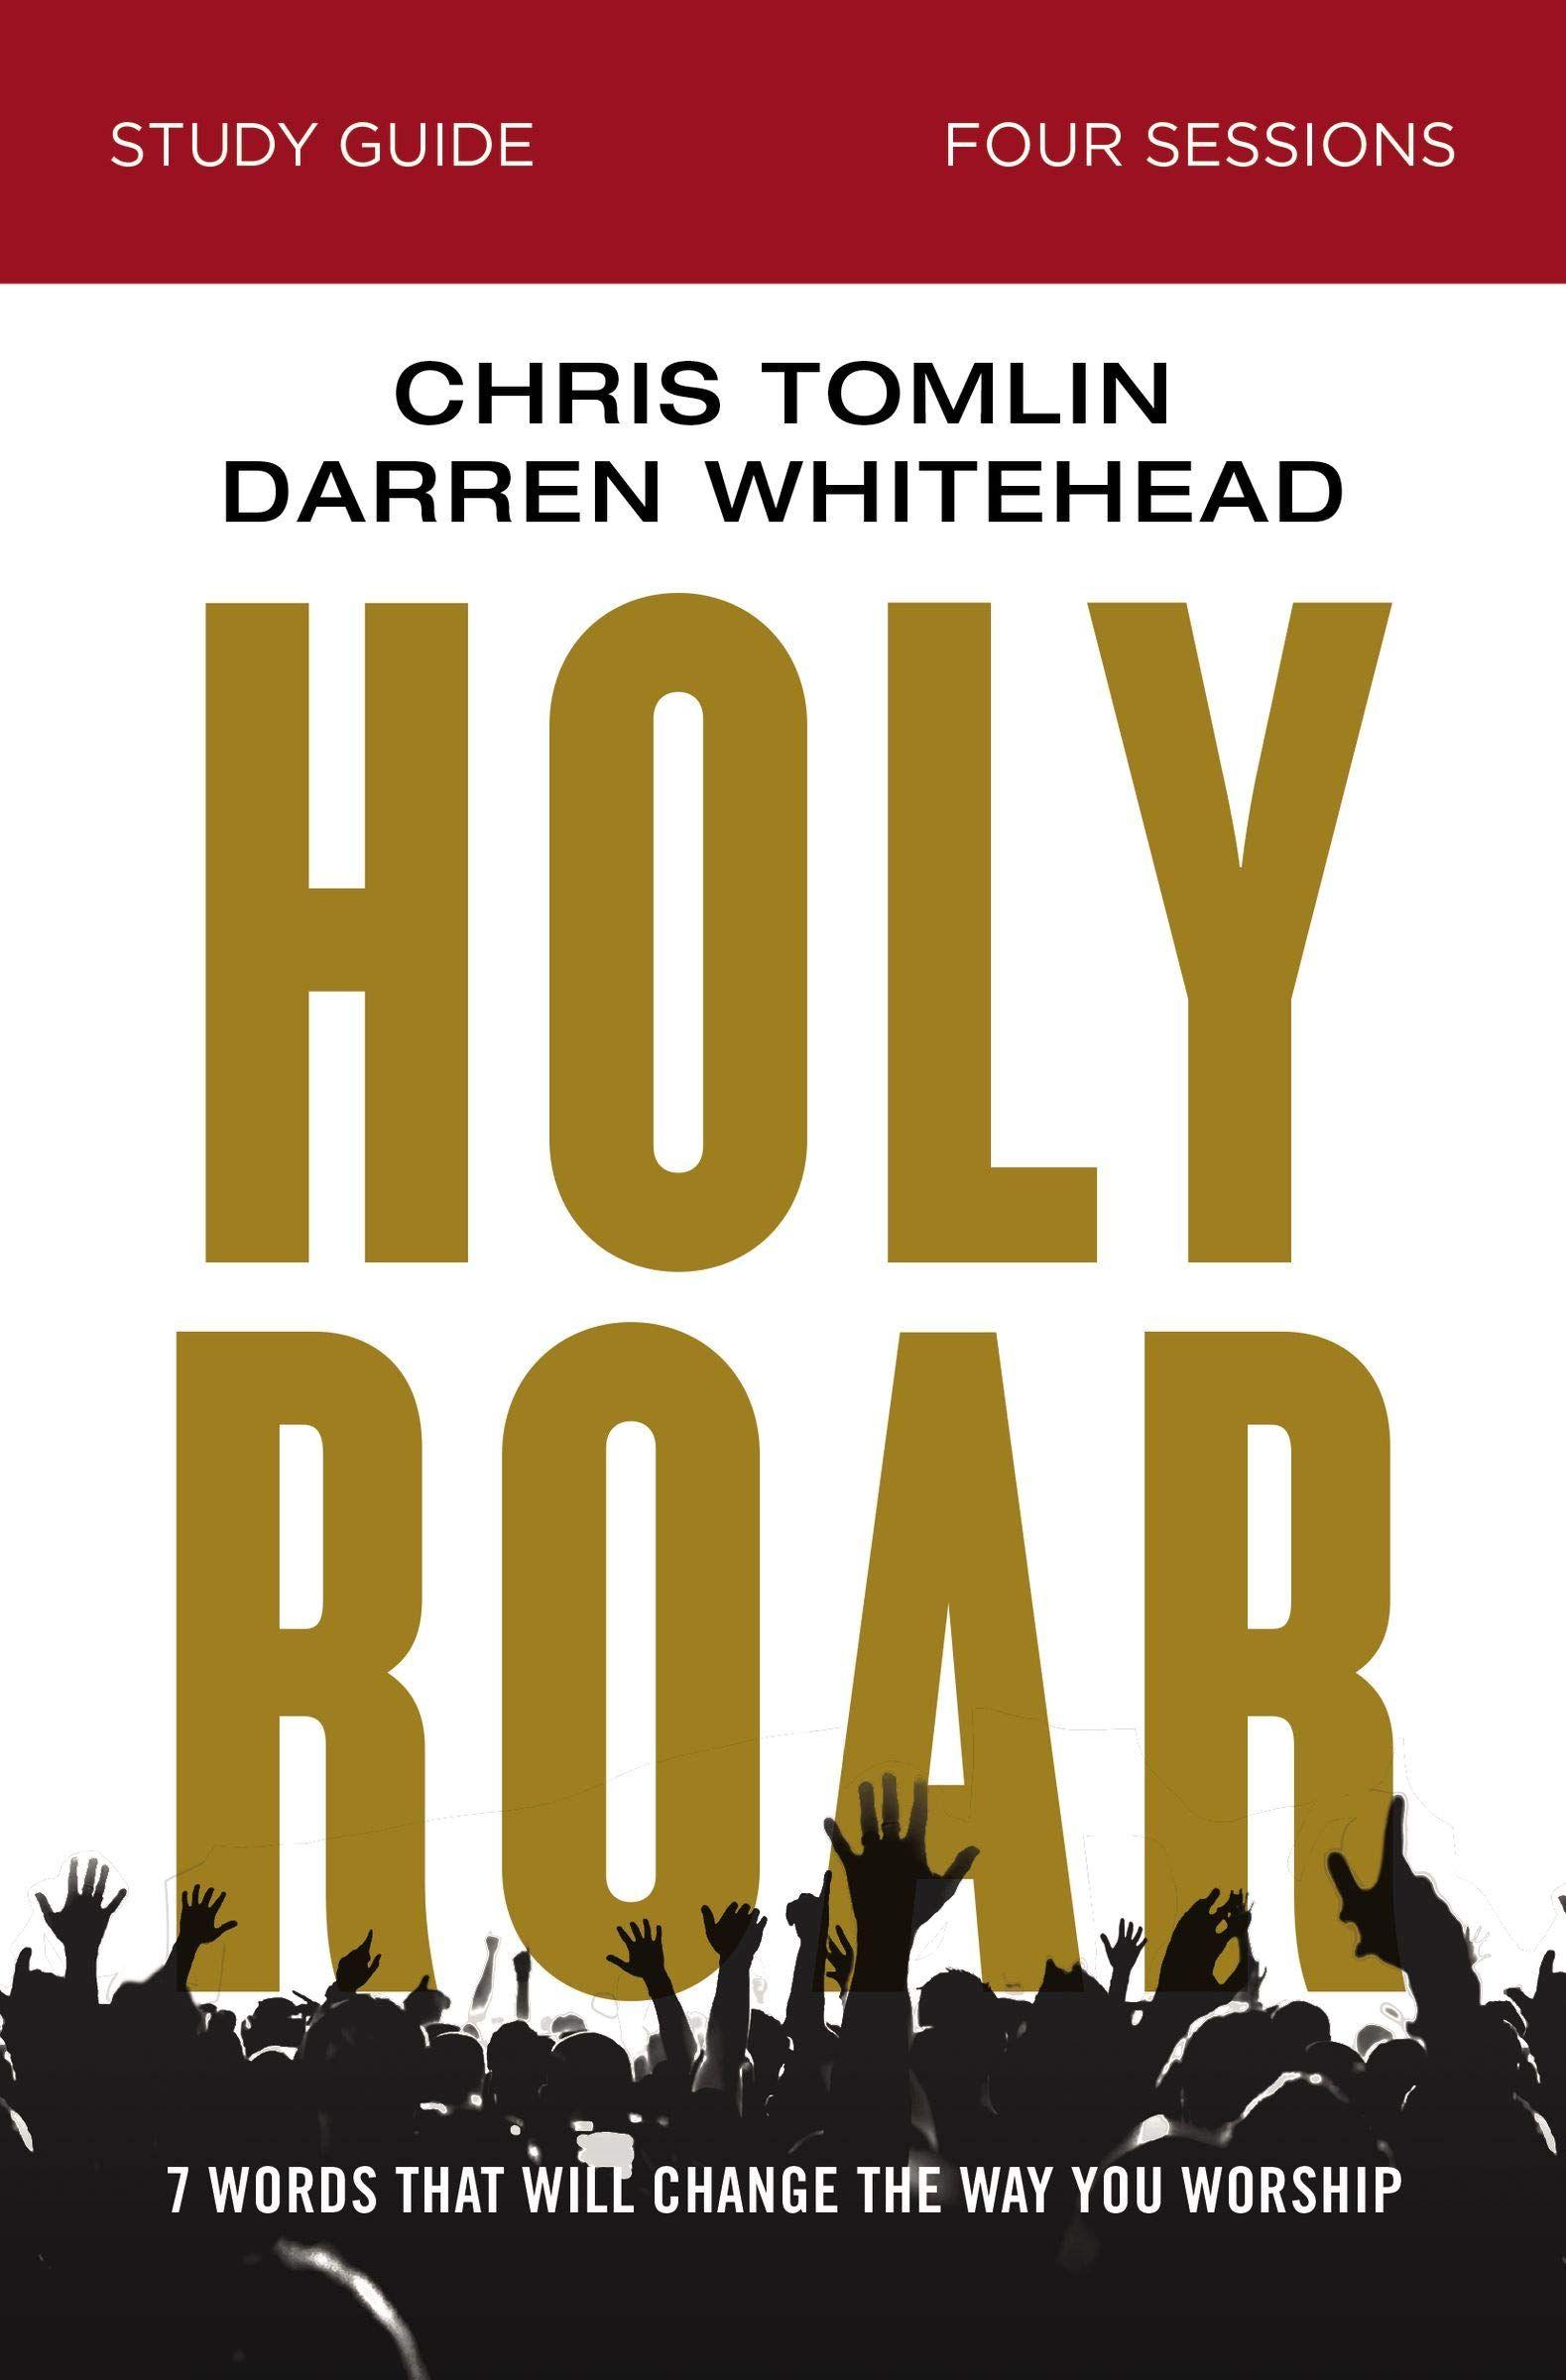 43+ Books on worship pdf ideas in 2021